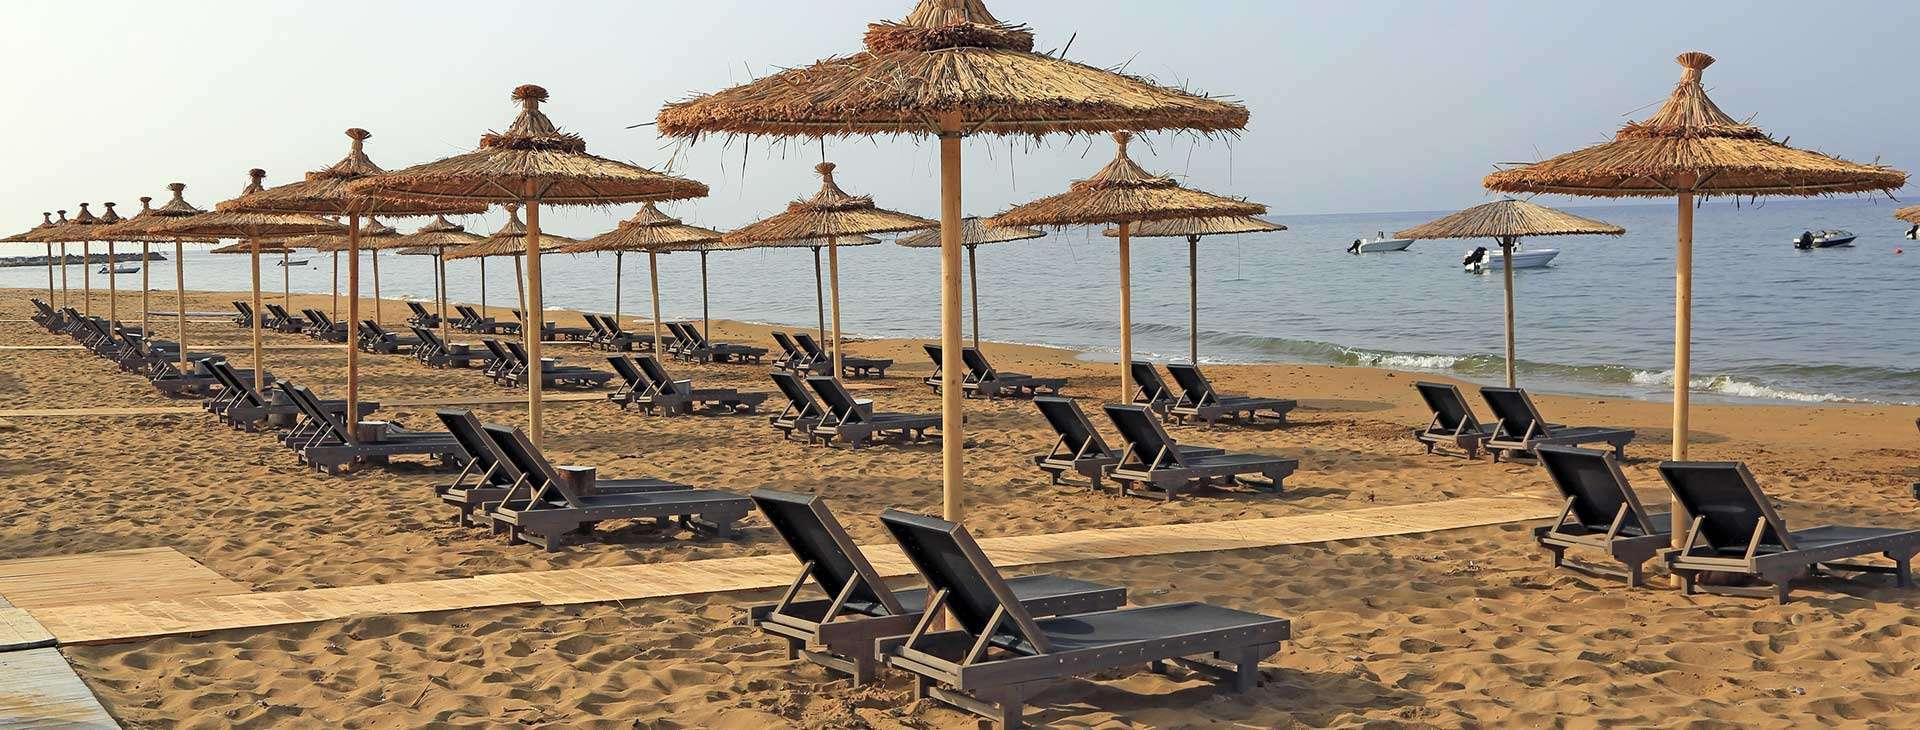 Labranda Sandy Beach (ex Aquis Sandy Beach) - plaża